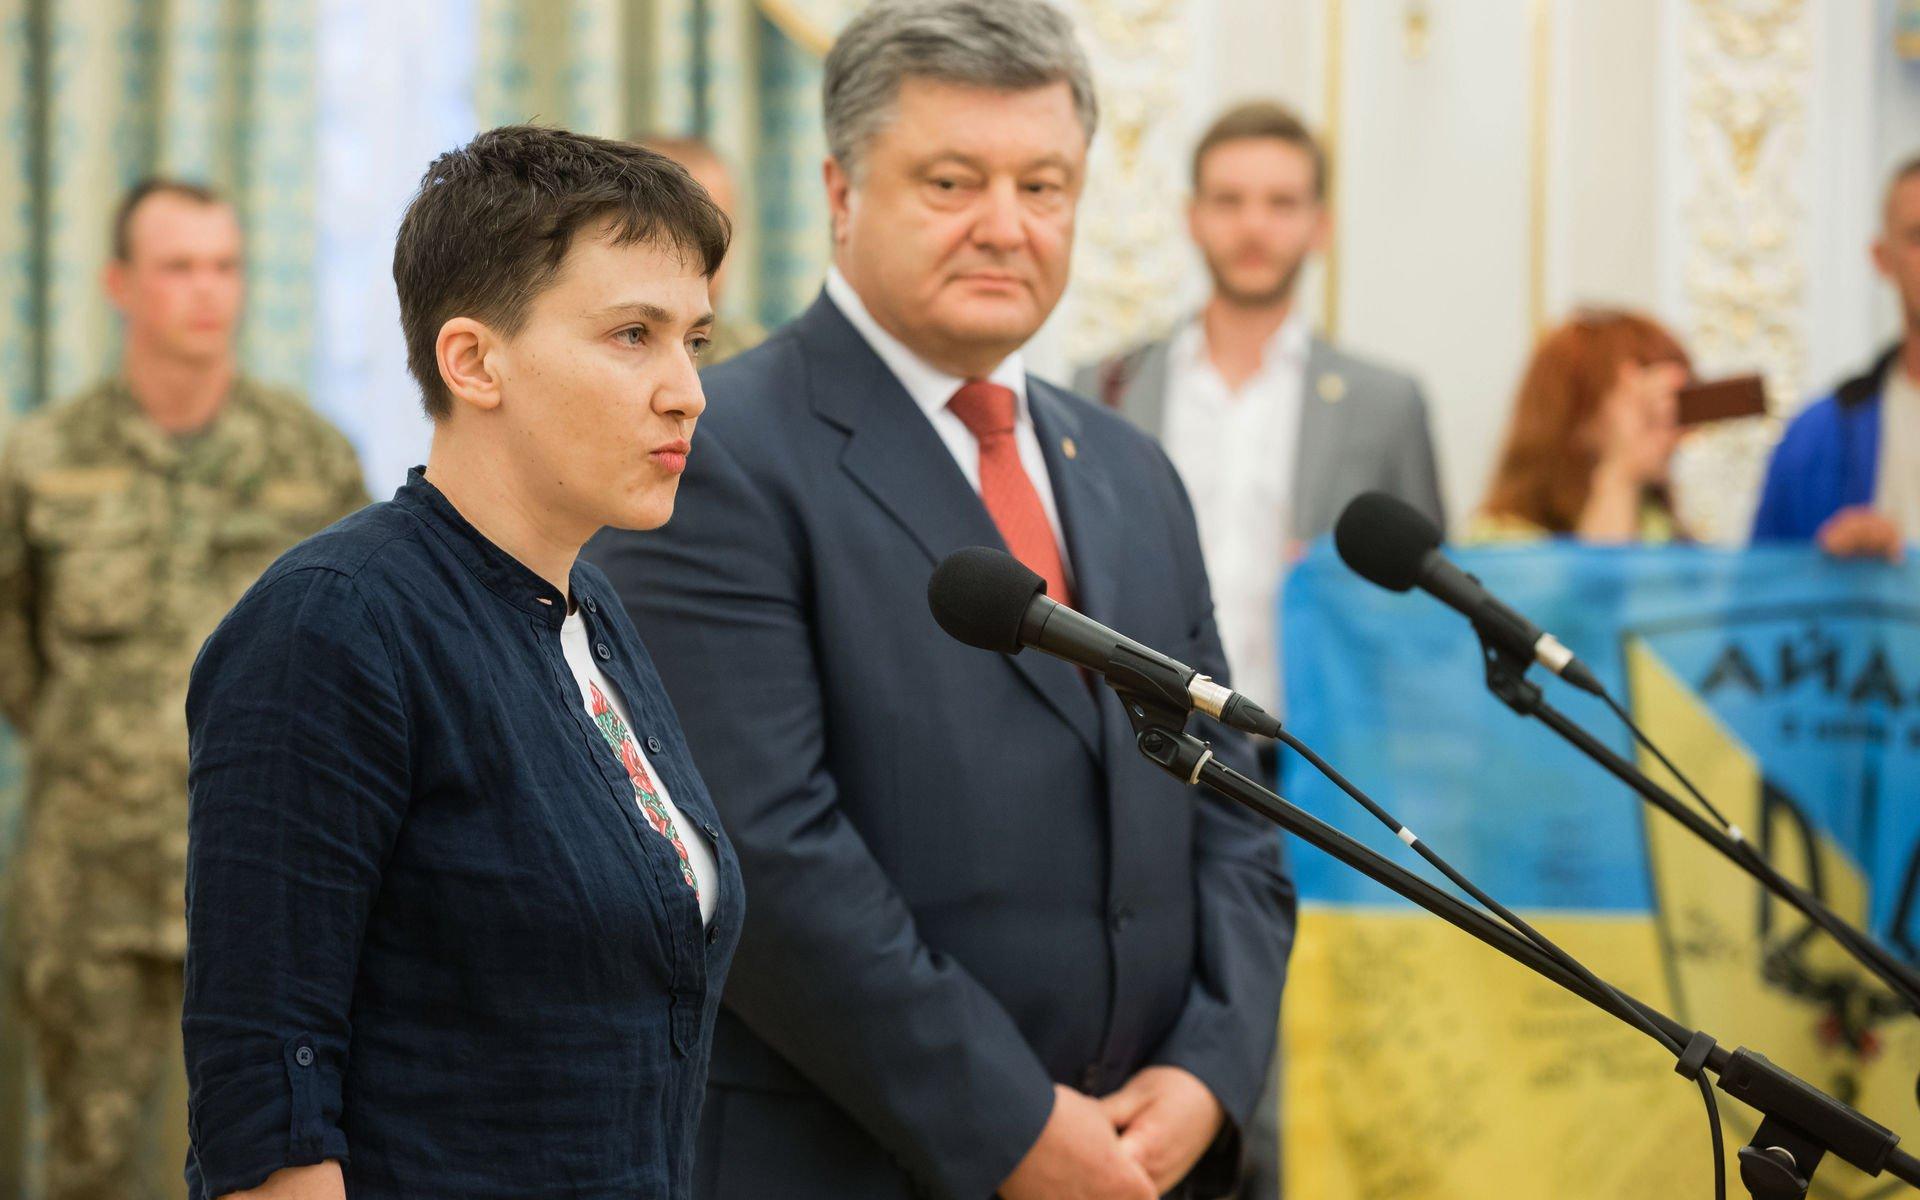 Merino двухслойное савченко на митинге обвинила порошенко в обмане основе